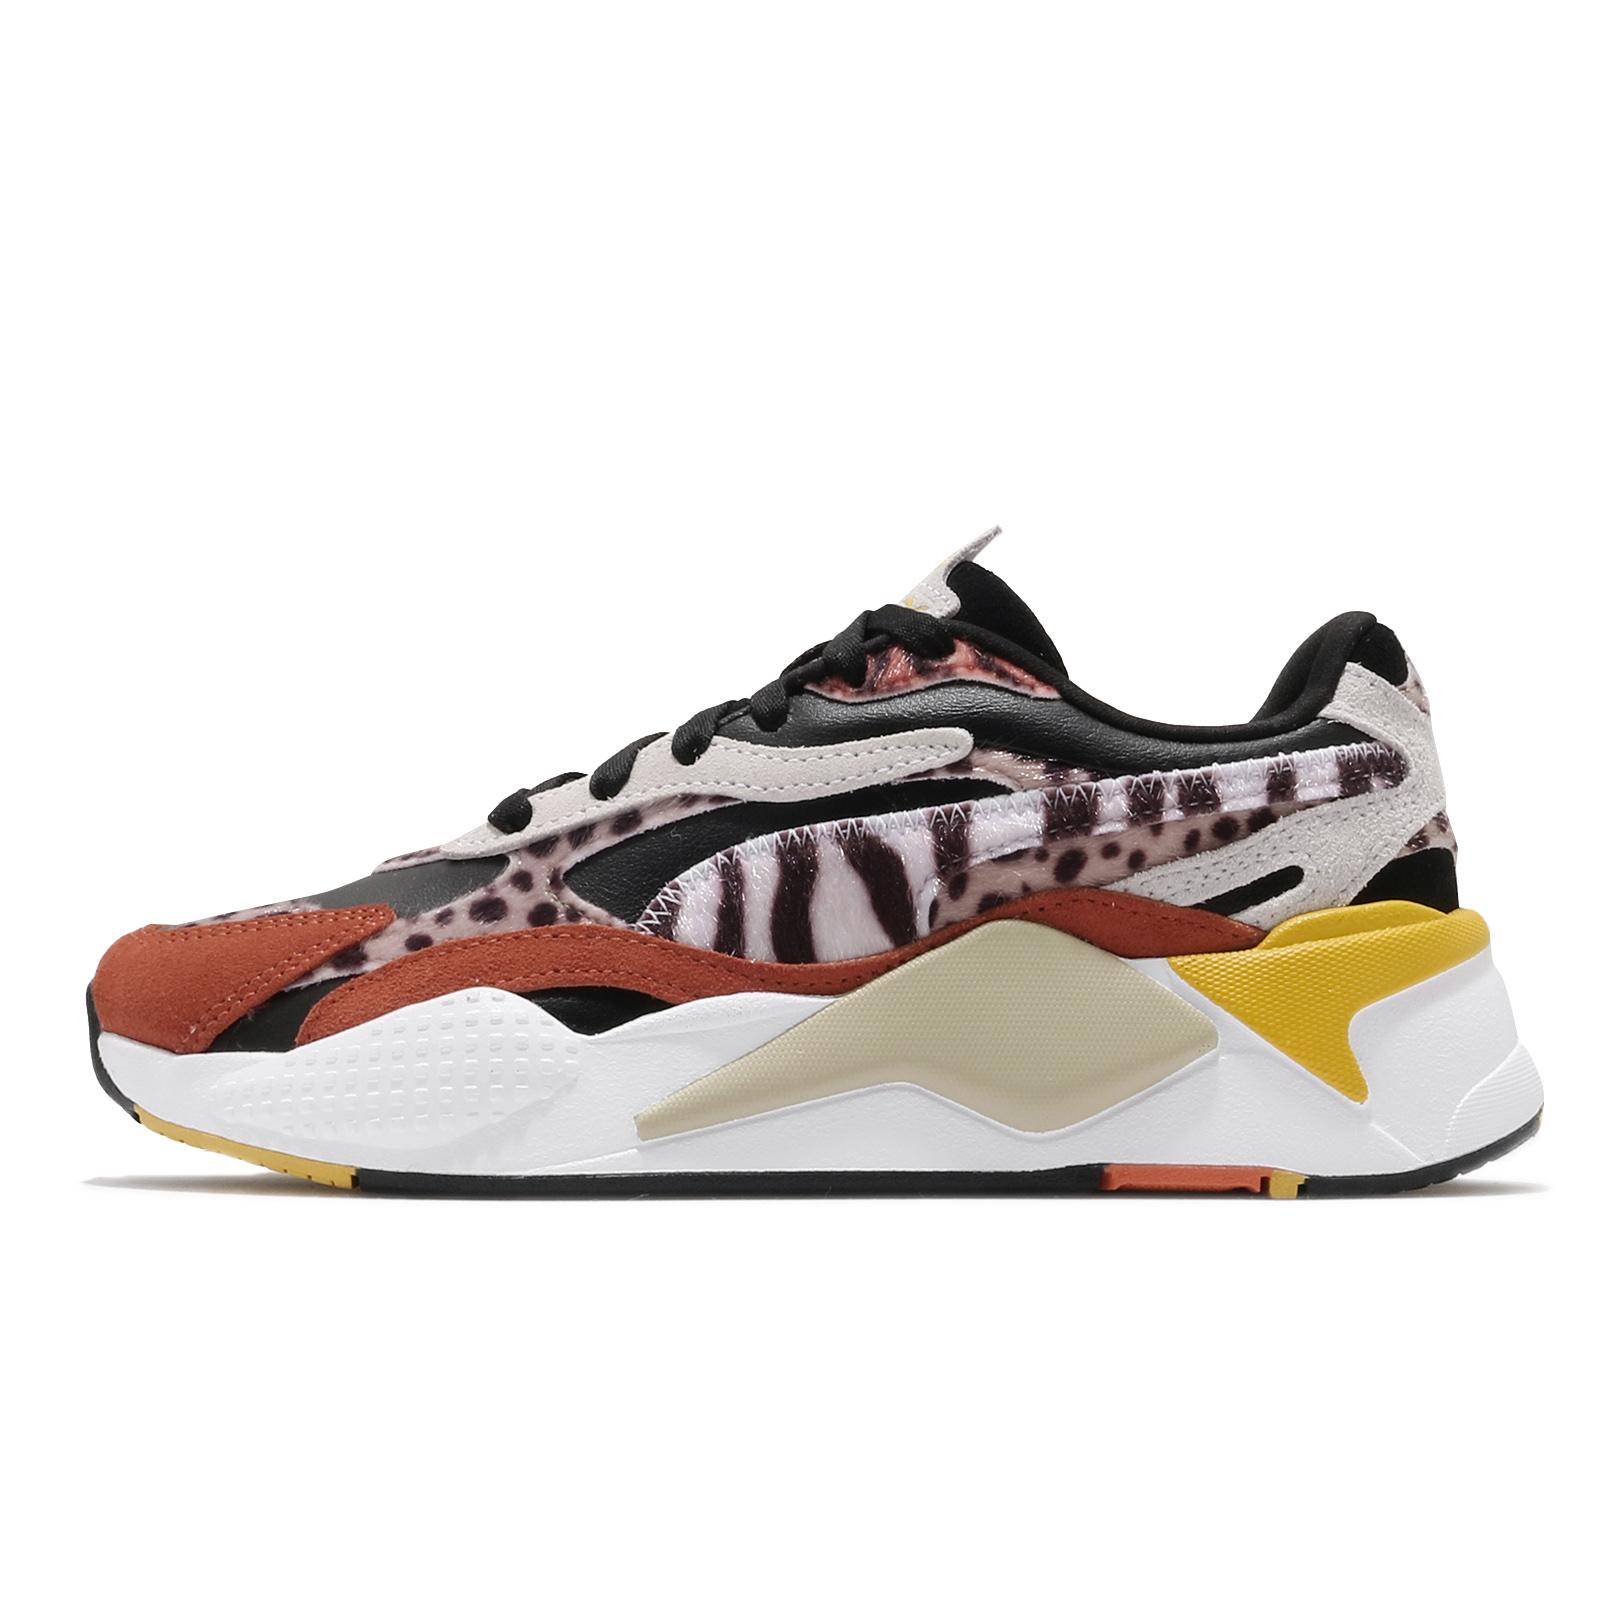 Puma 休閒鞋 RS-X3 W.Cats 黑 橘 女鞋 老爹鞋 貓 豹紋 復古慢跑鞋 Jolin 代言款 【ACS】